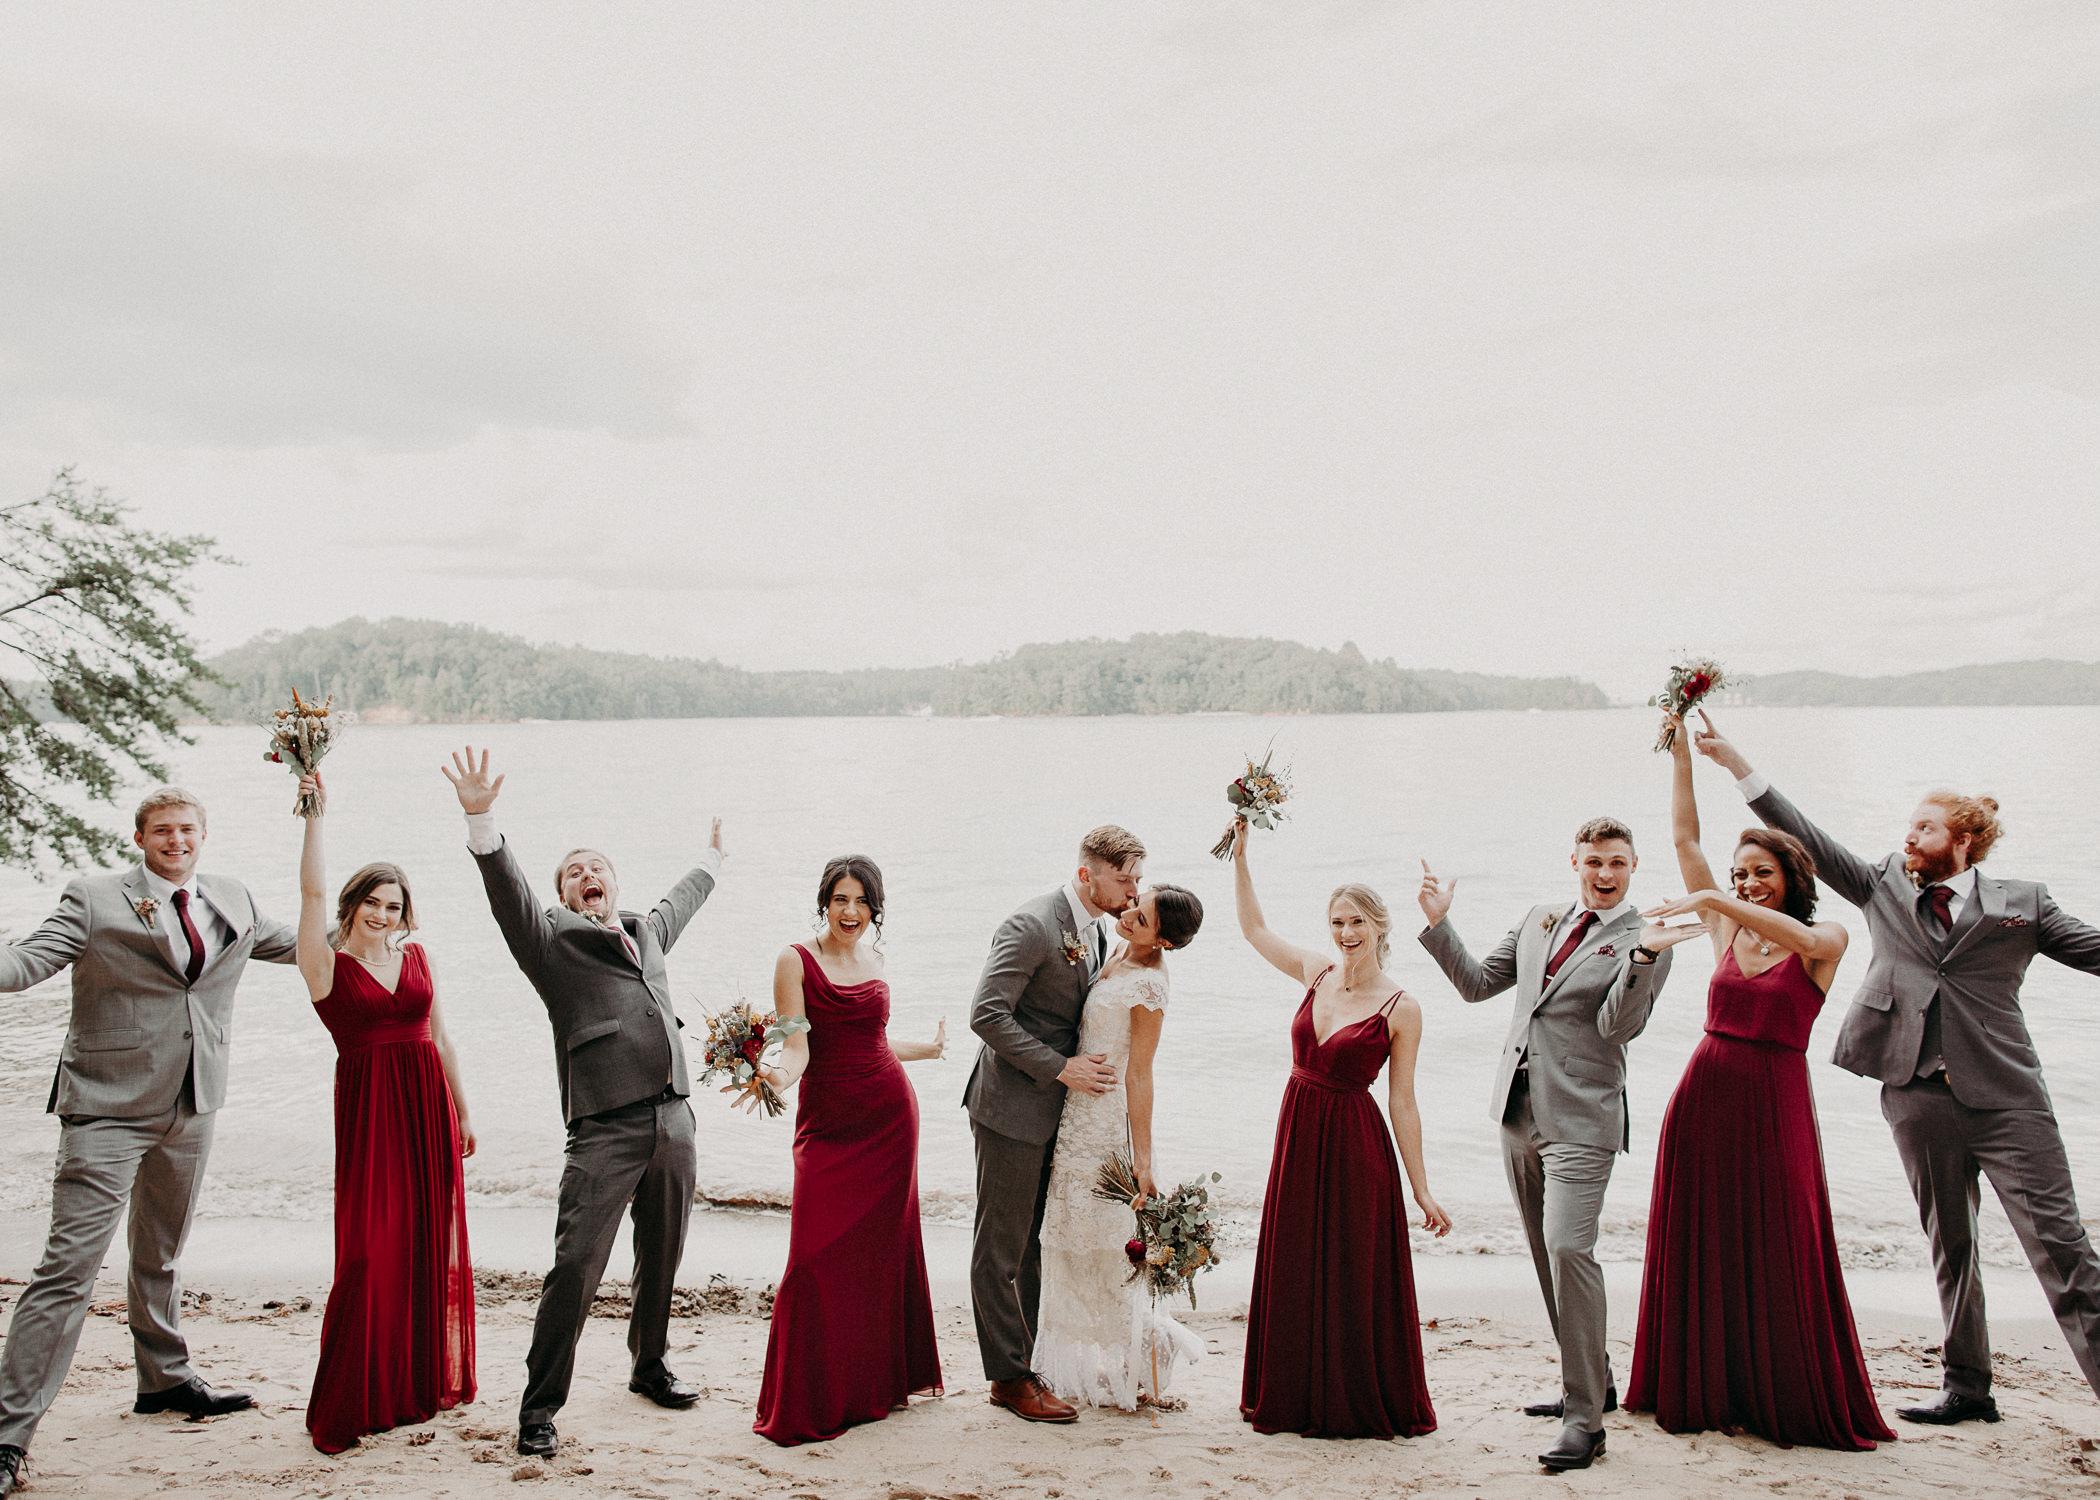 78 Bride & Groom Portraits before the ceremony on wedding day - Atlanta Wedding Photographer .jpg